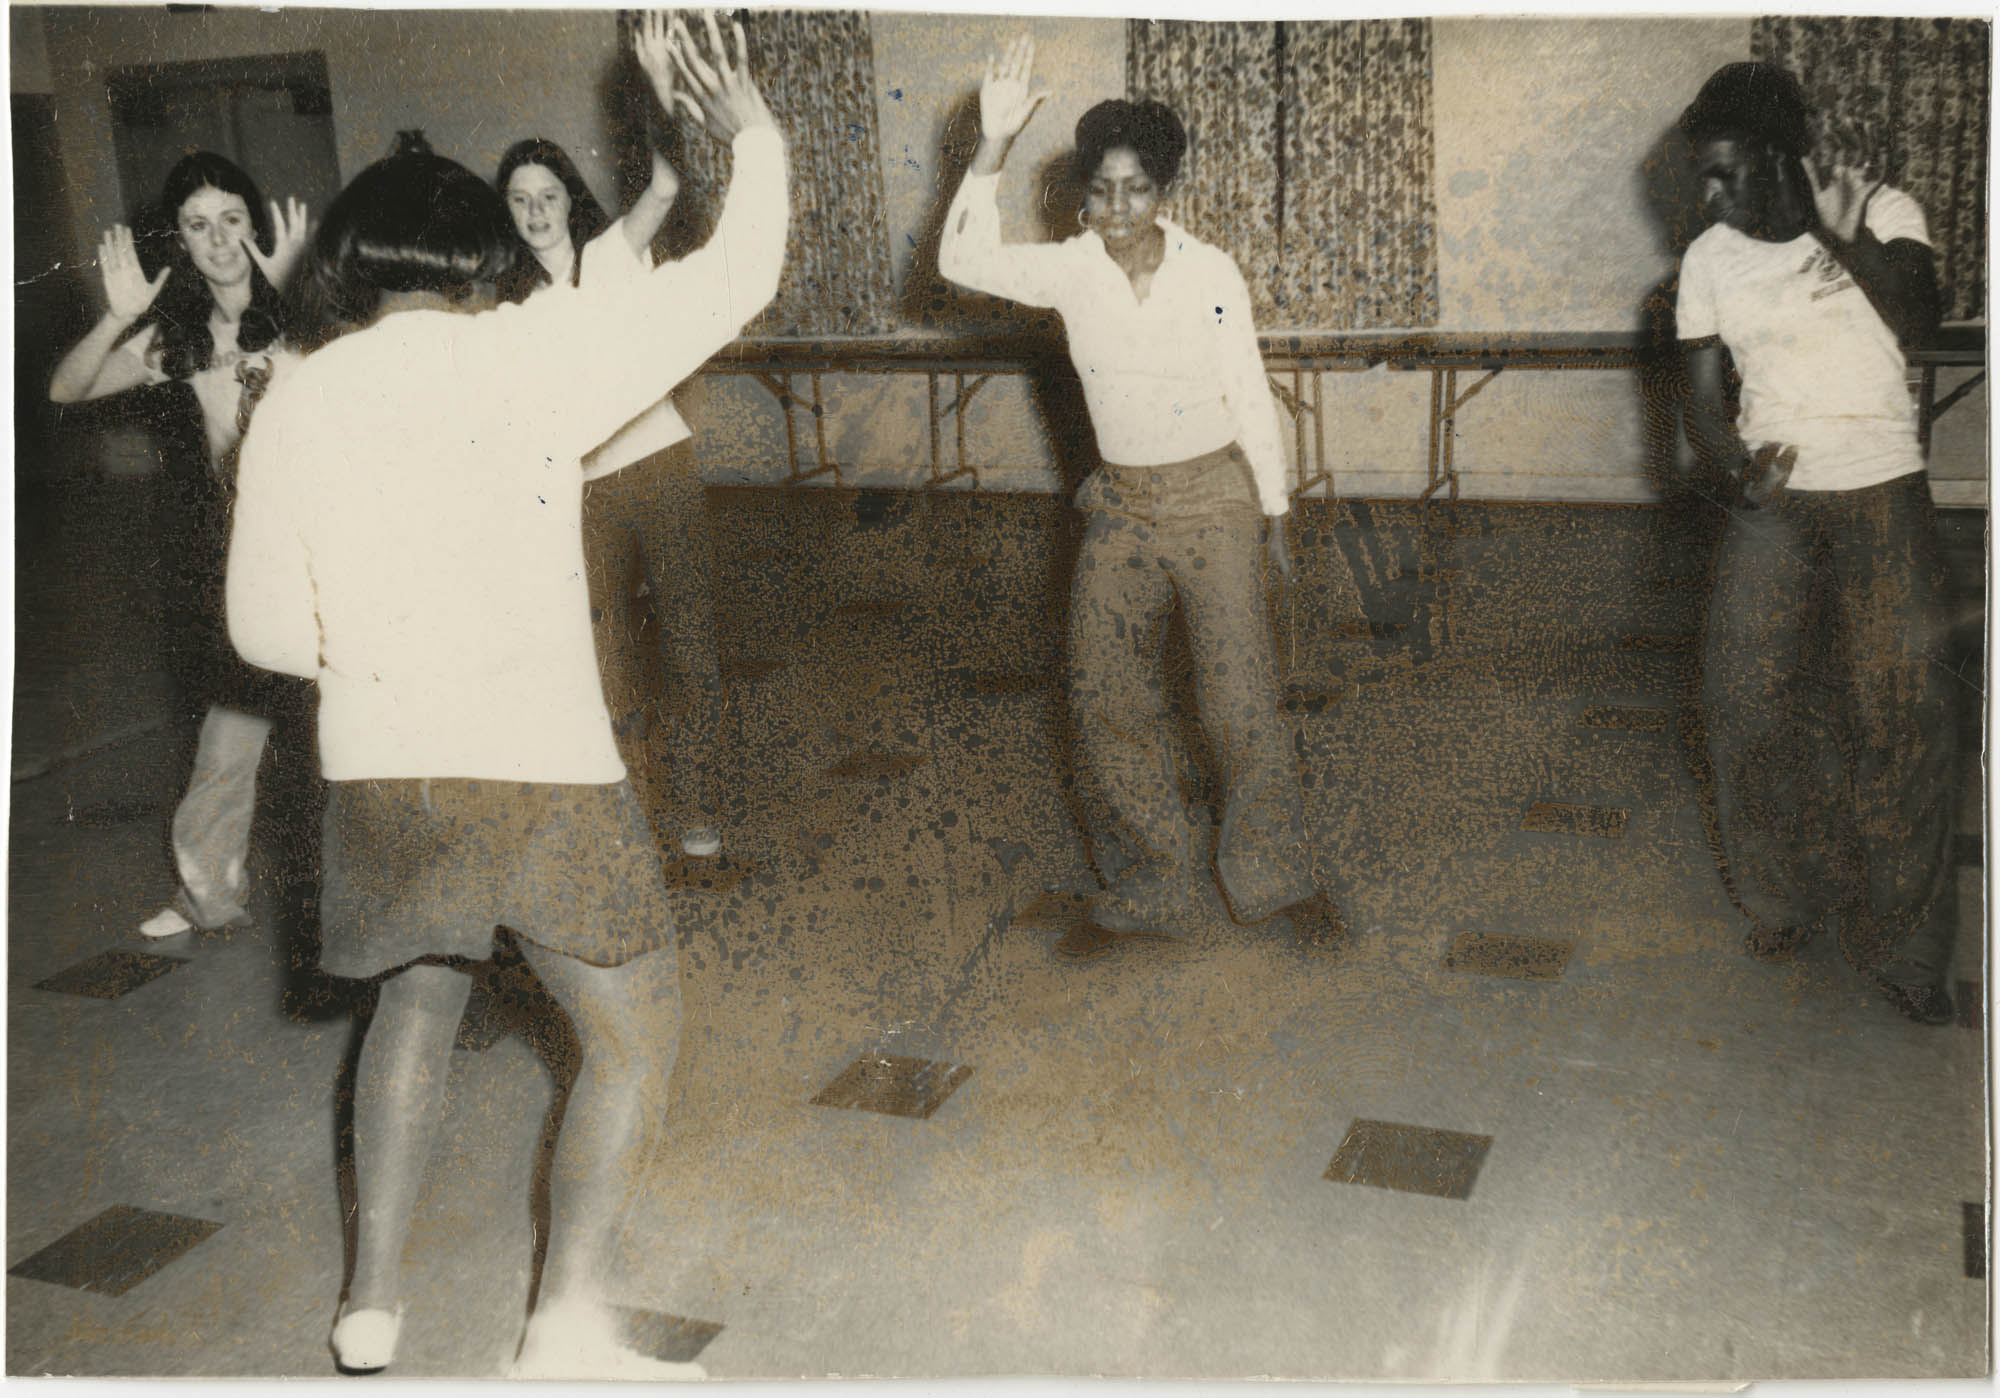 Photograph of People Dancing